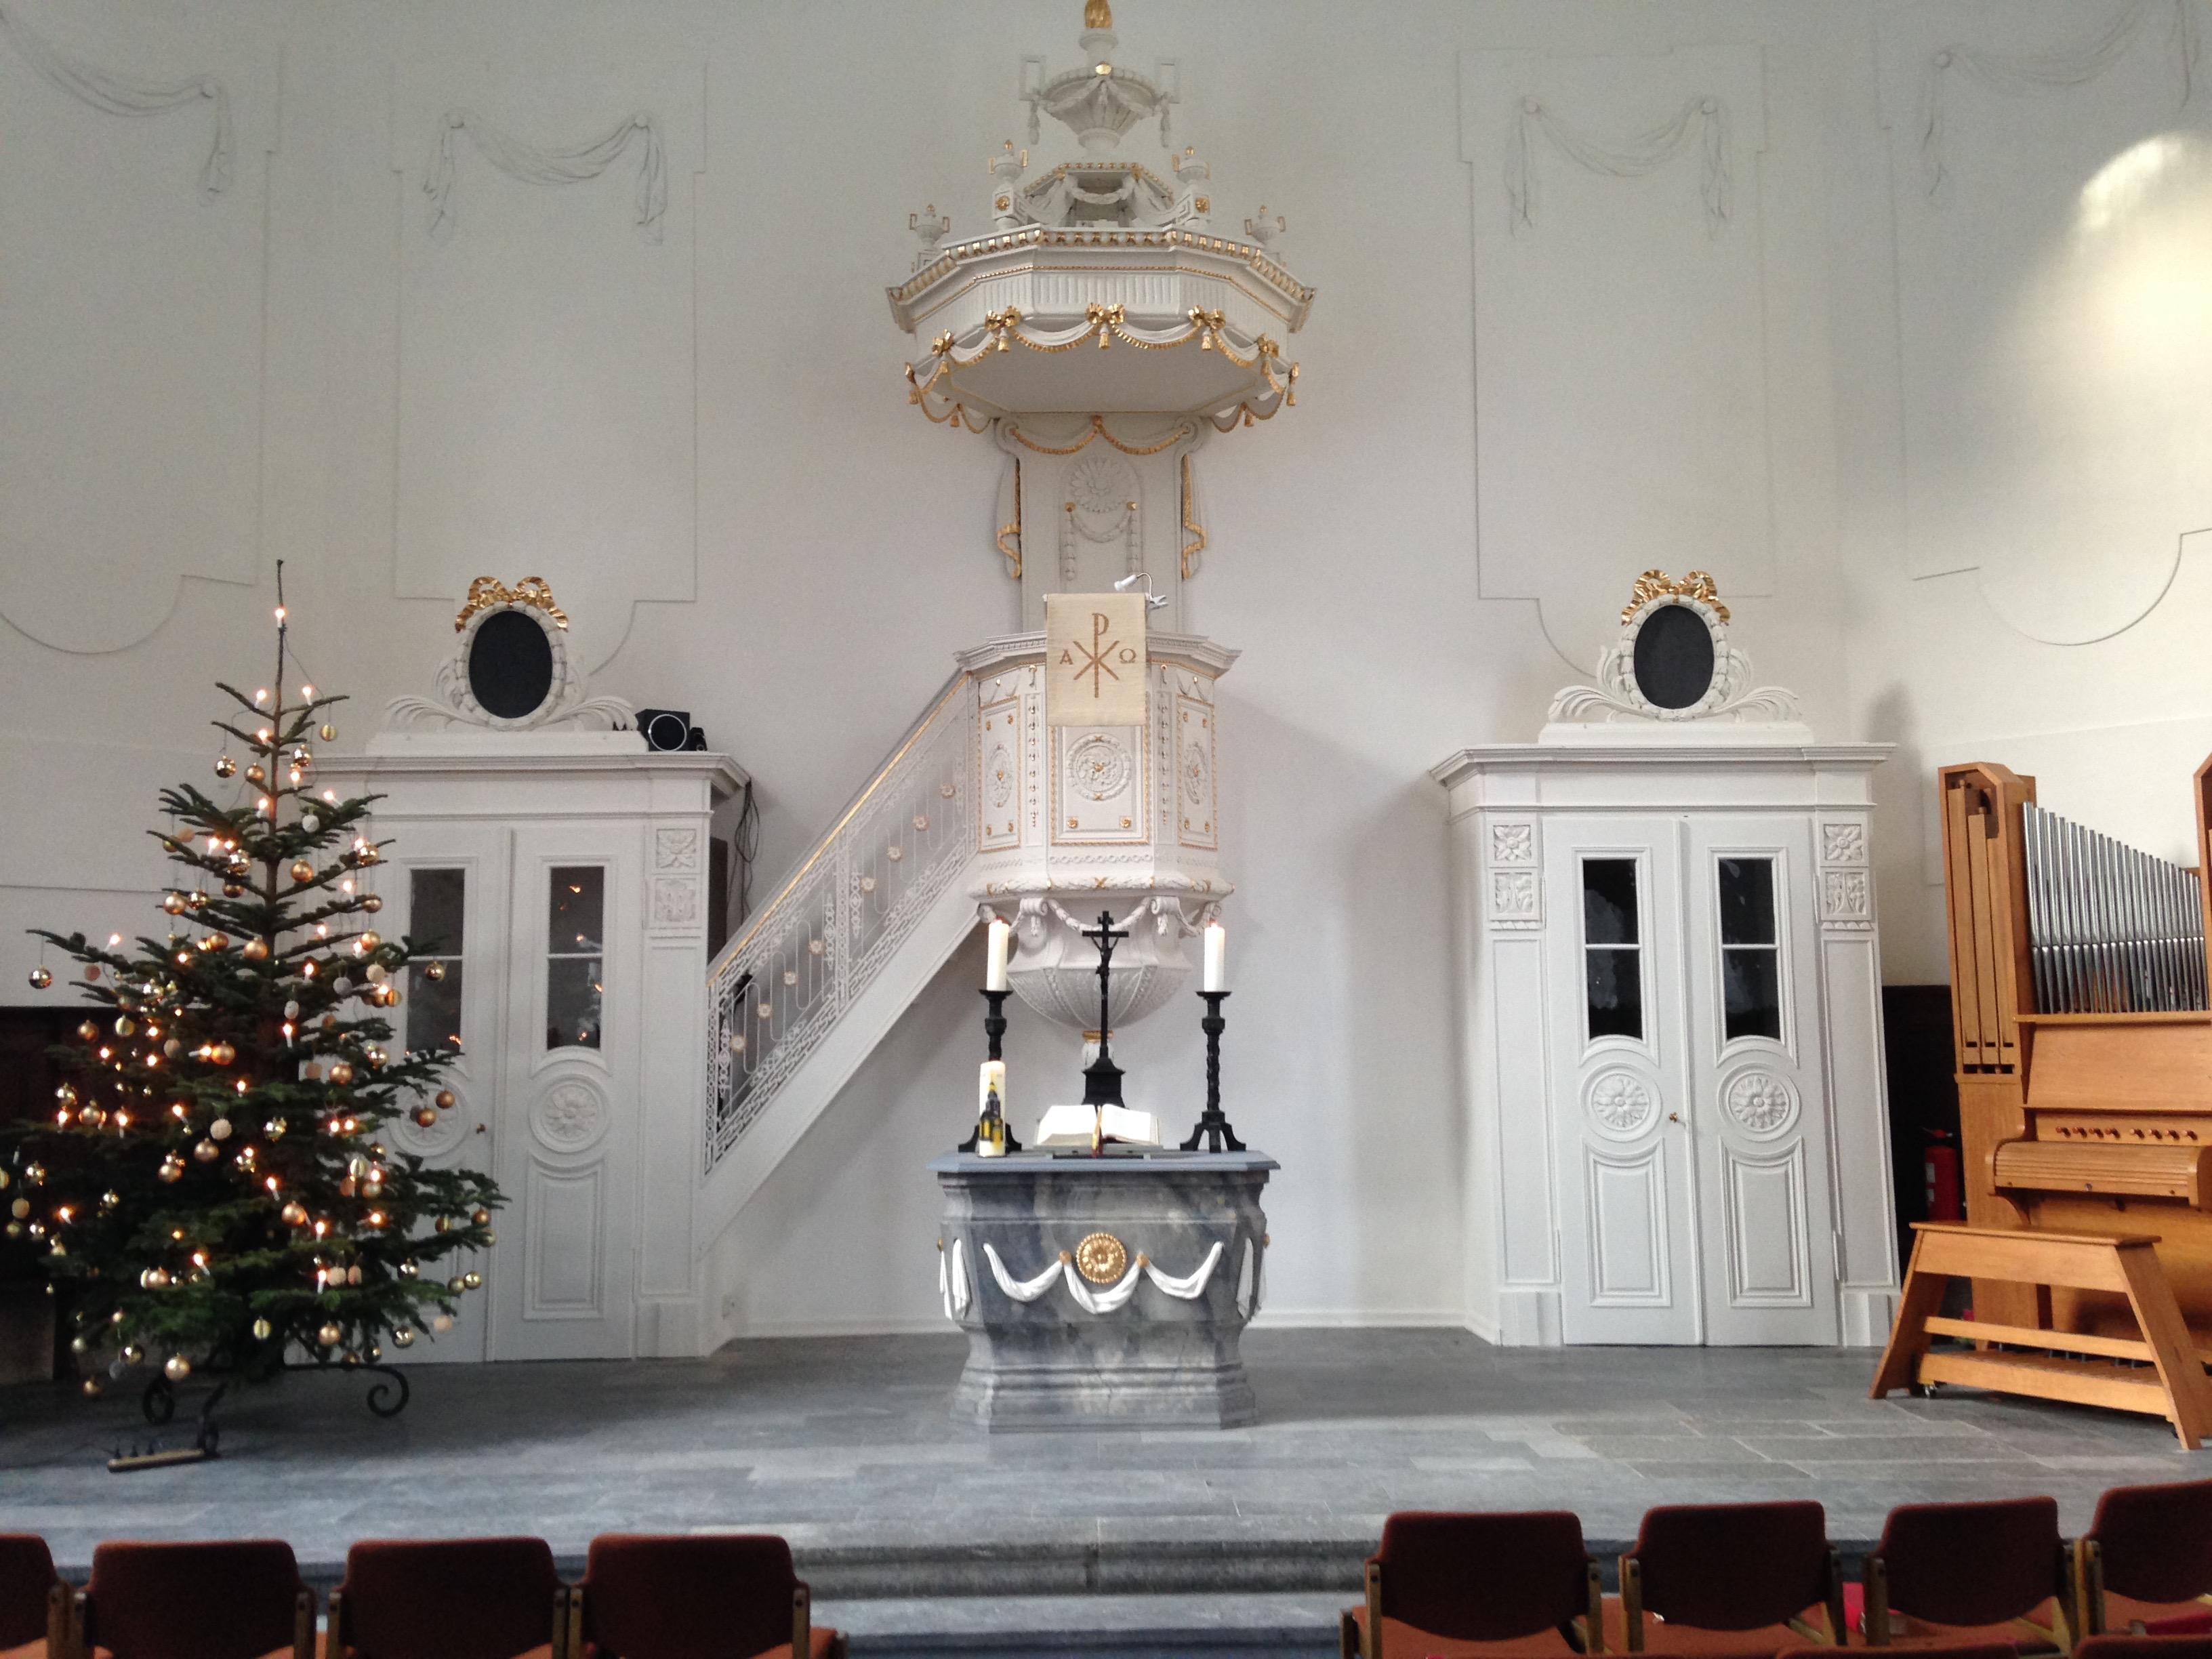 file evangelische stadtkirche monschau prinzipalwand. Black Bedroom Furniture Sets. Home Design Ideas